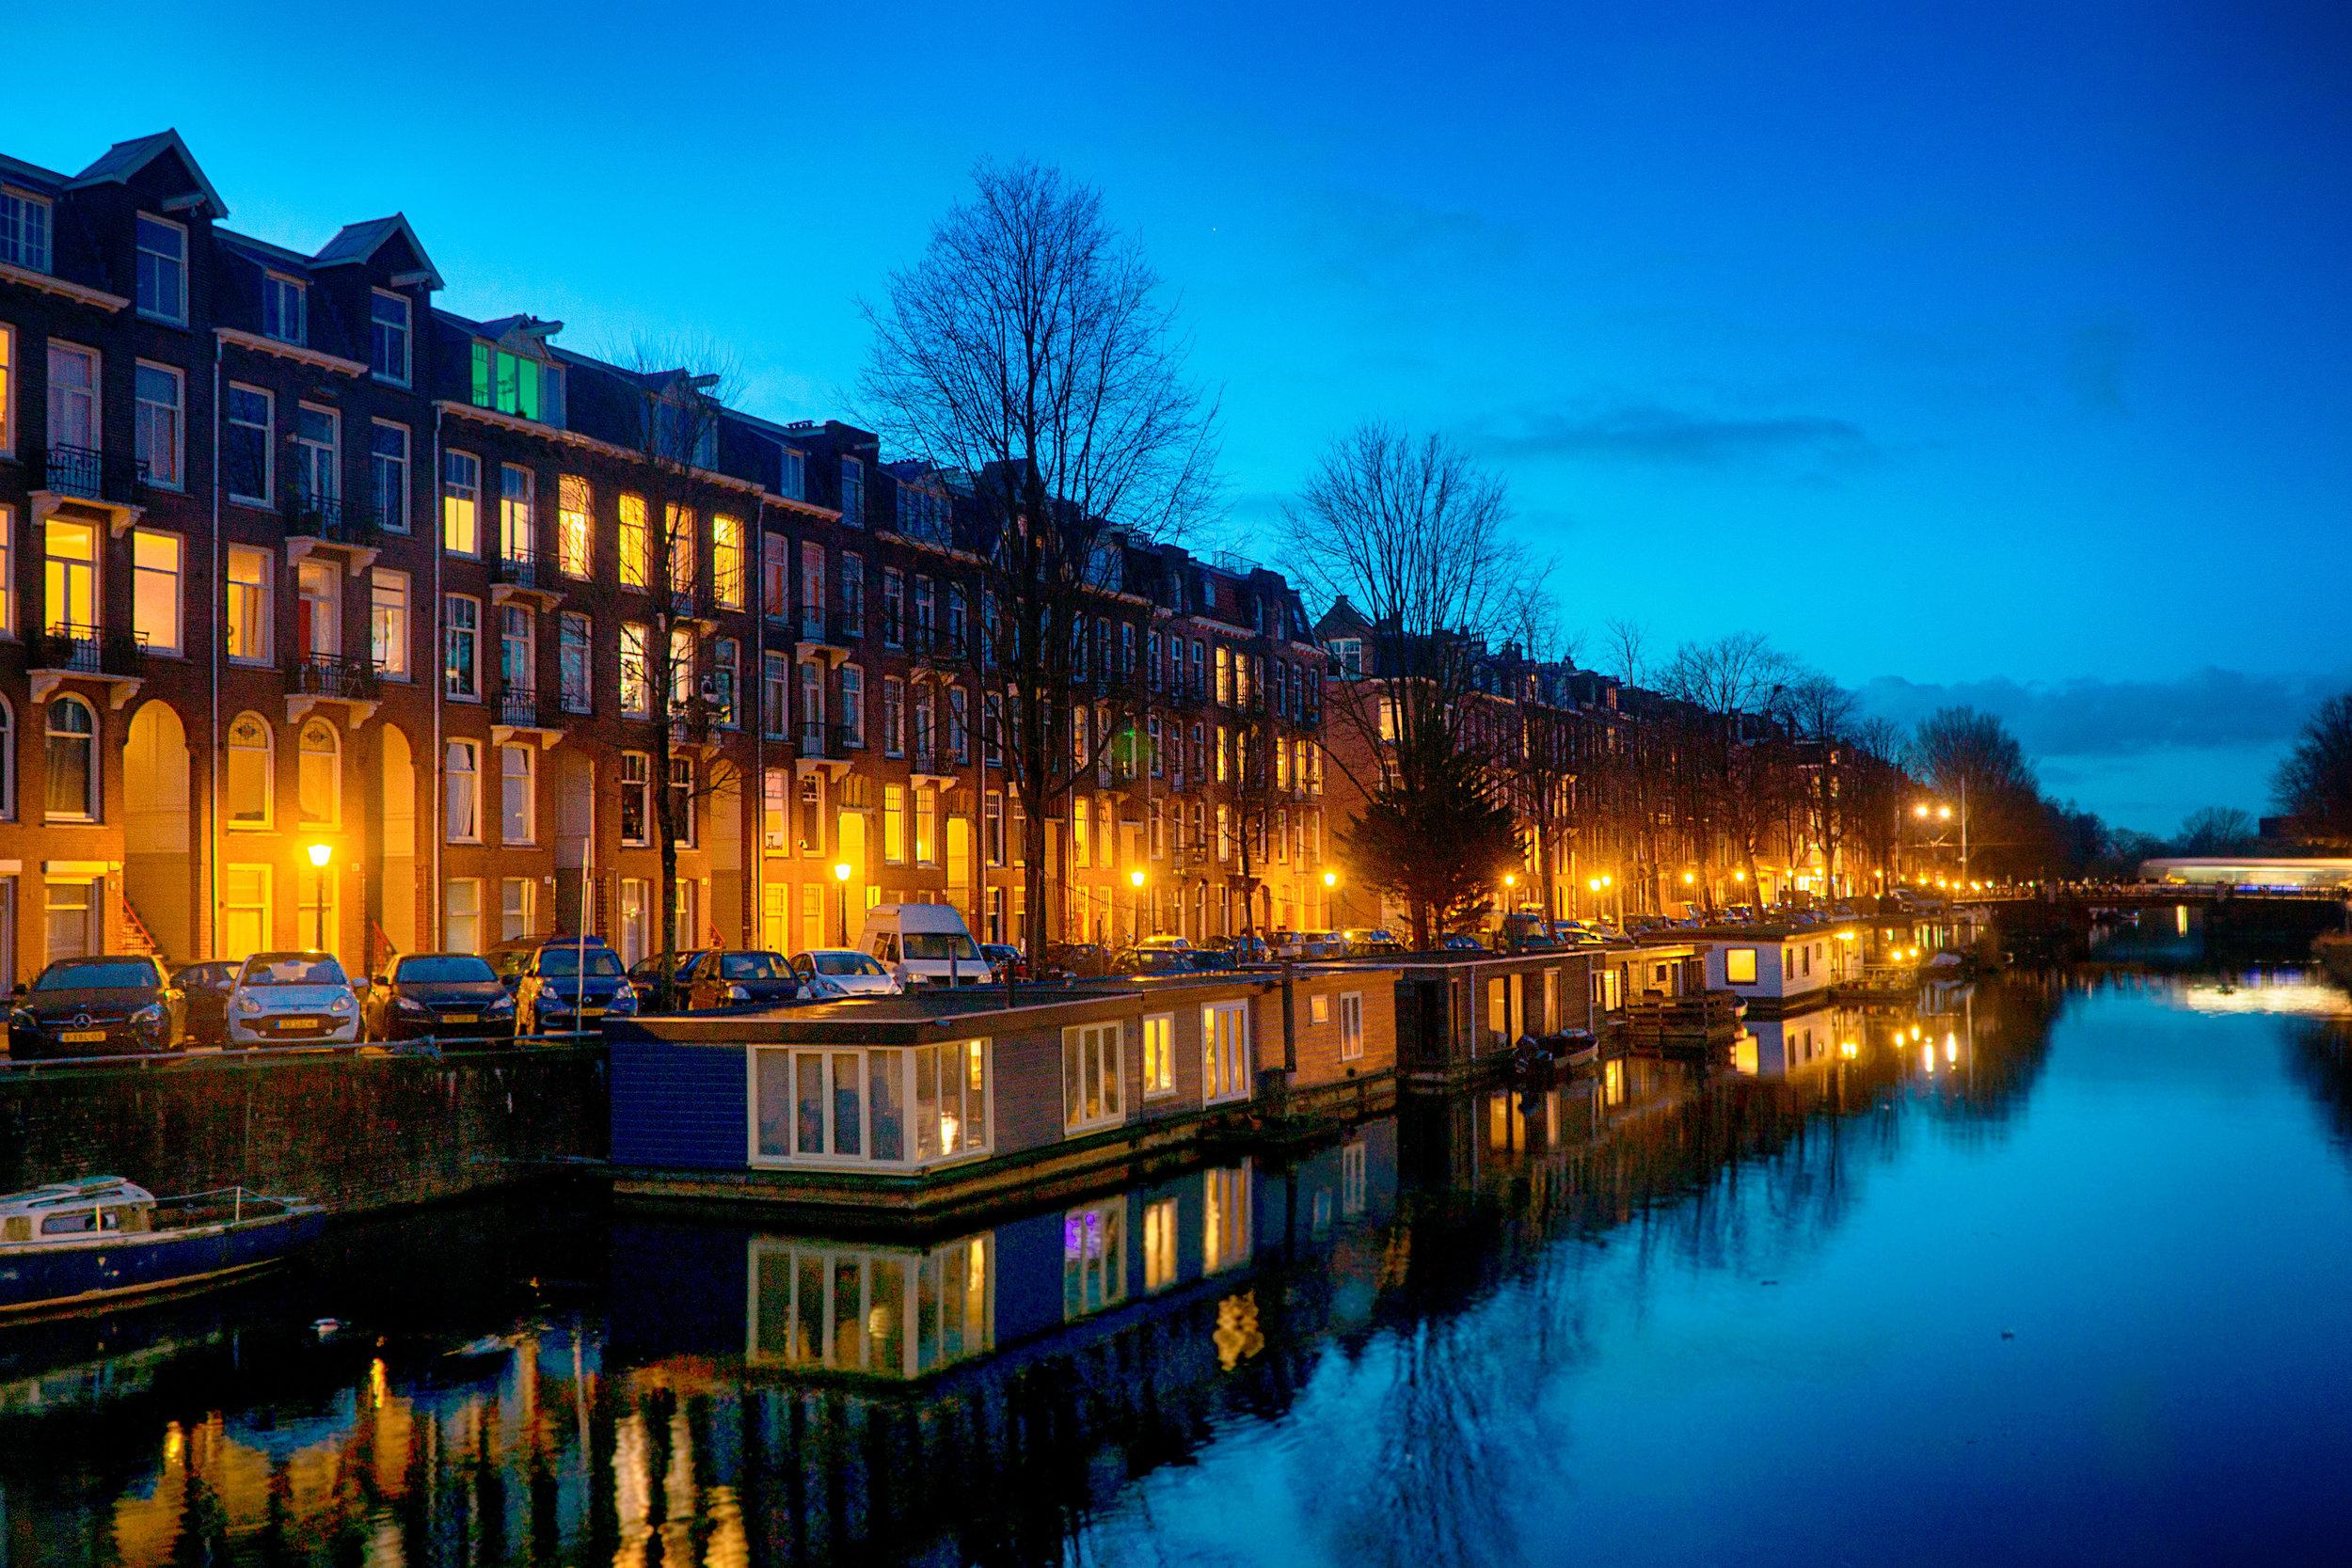 Amsterdam_vickygood_travel_photography2.jpg